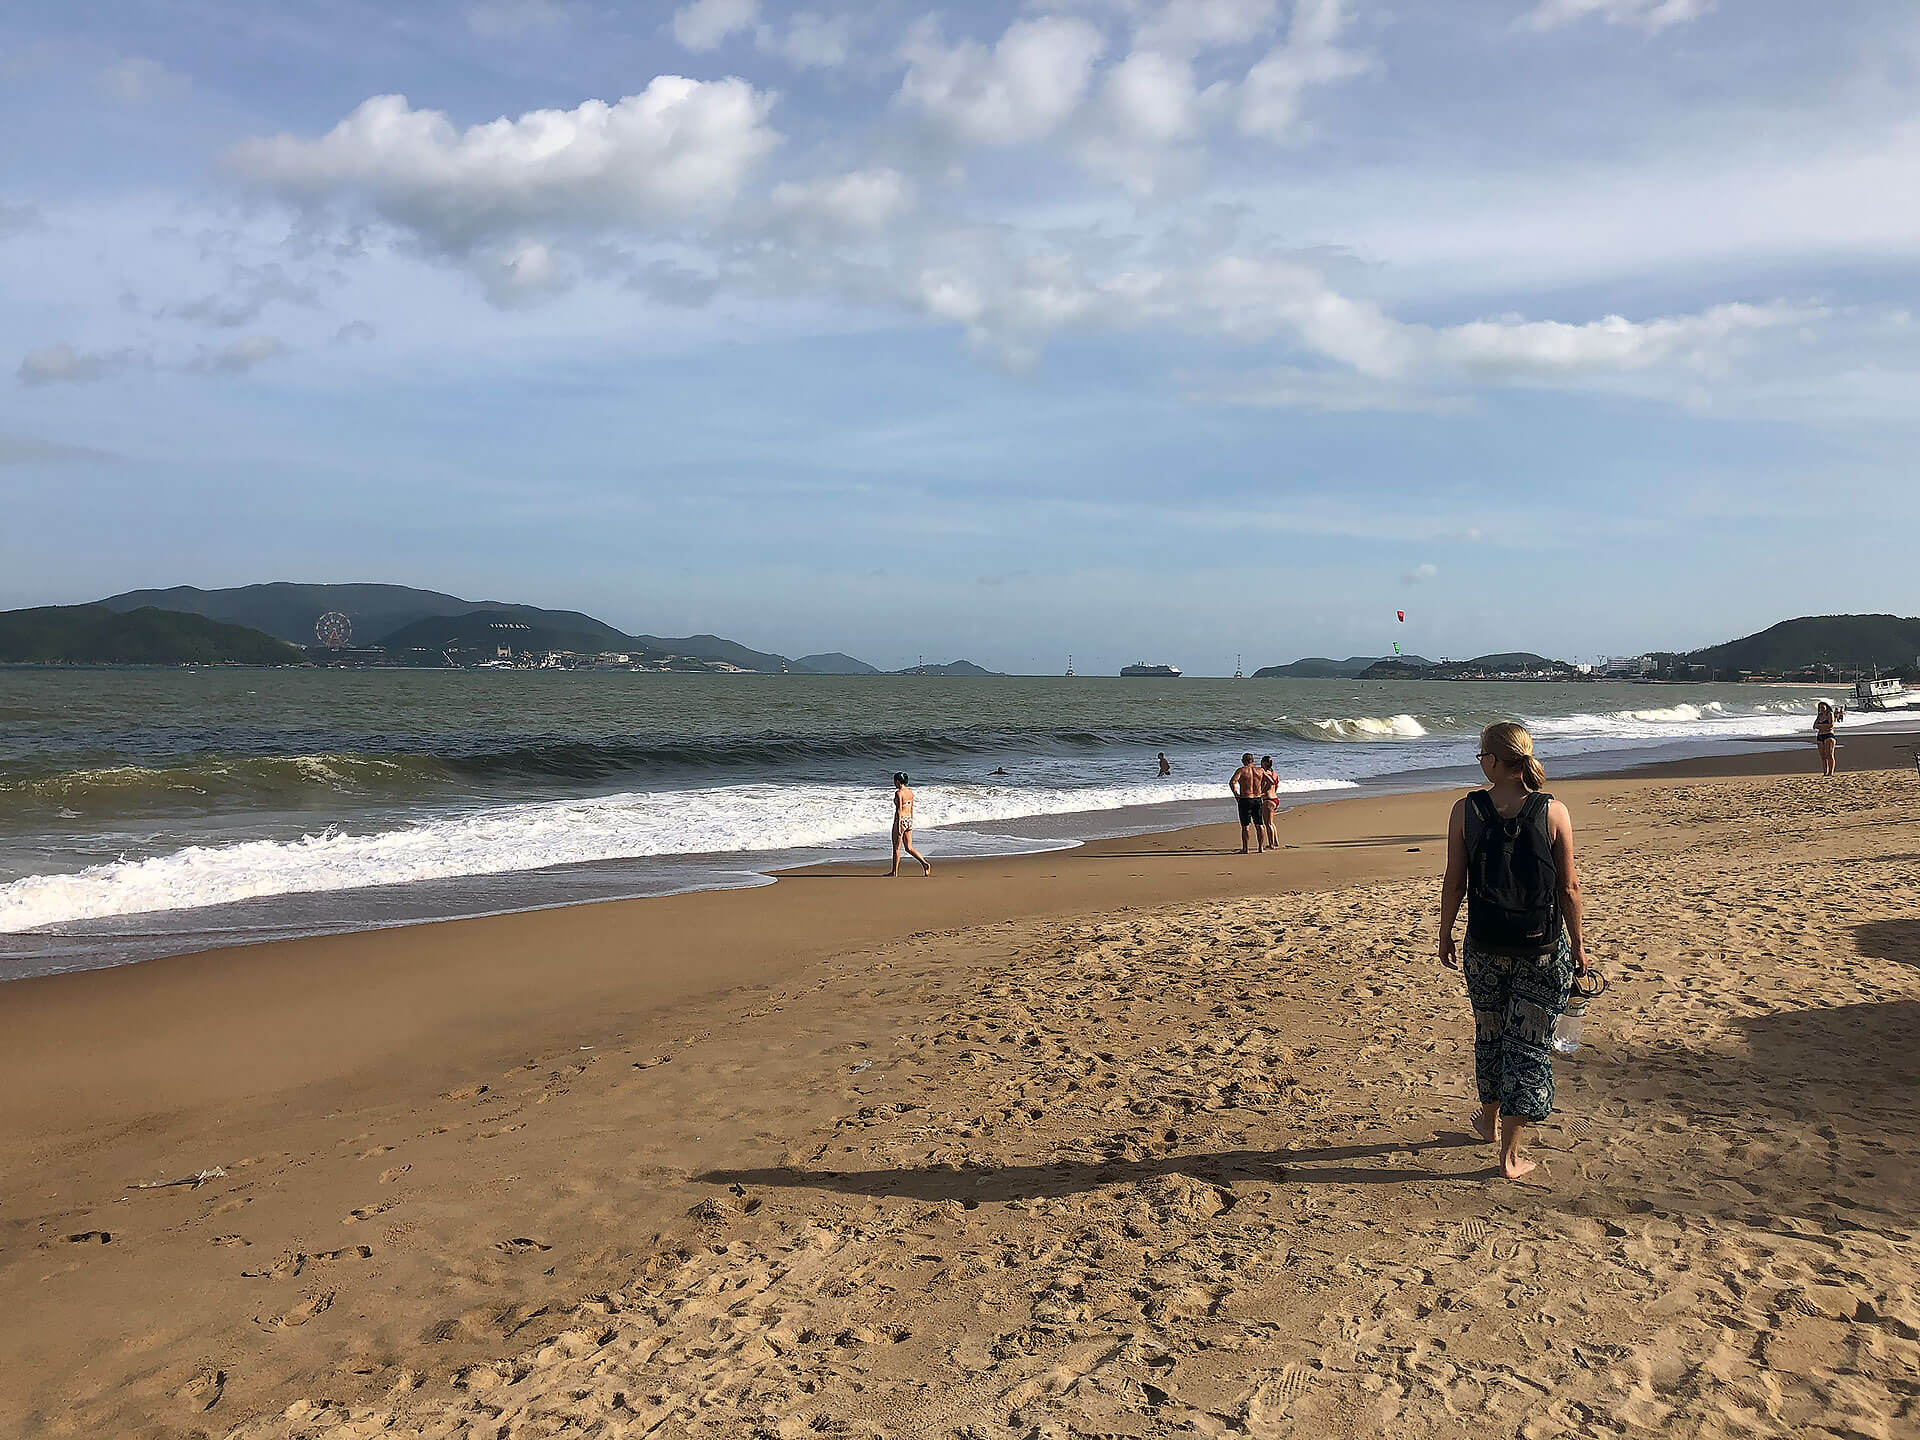 Am Strand von Nha Trang - Taschi